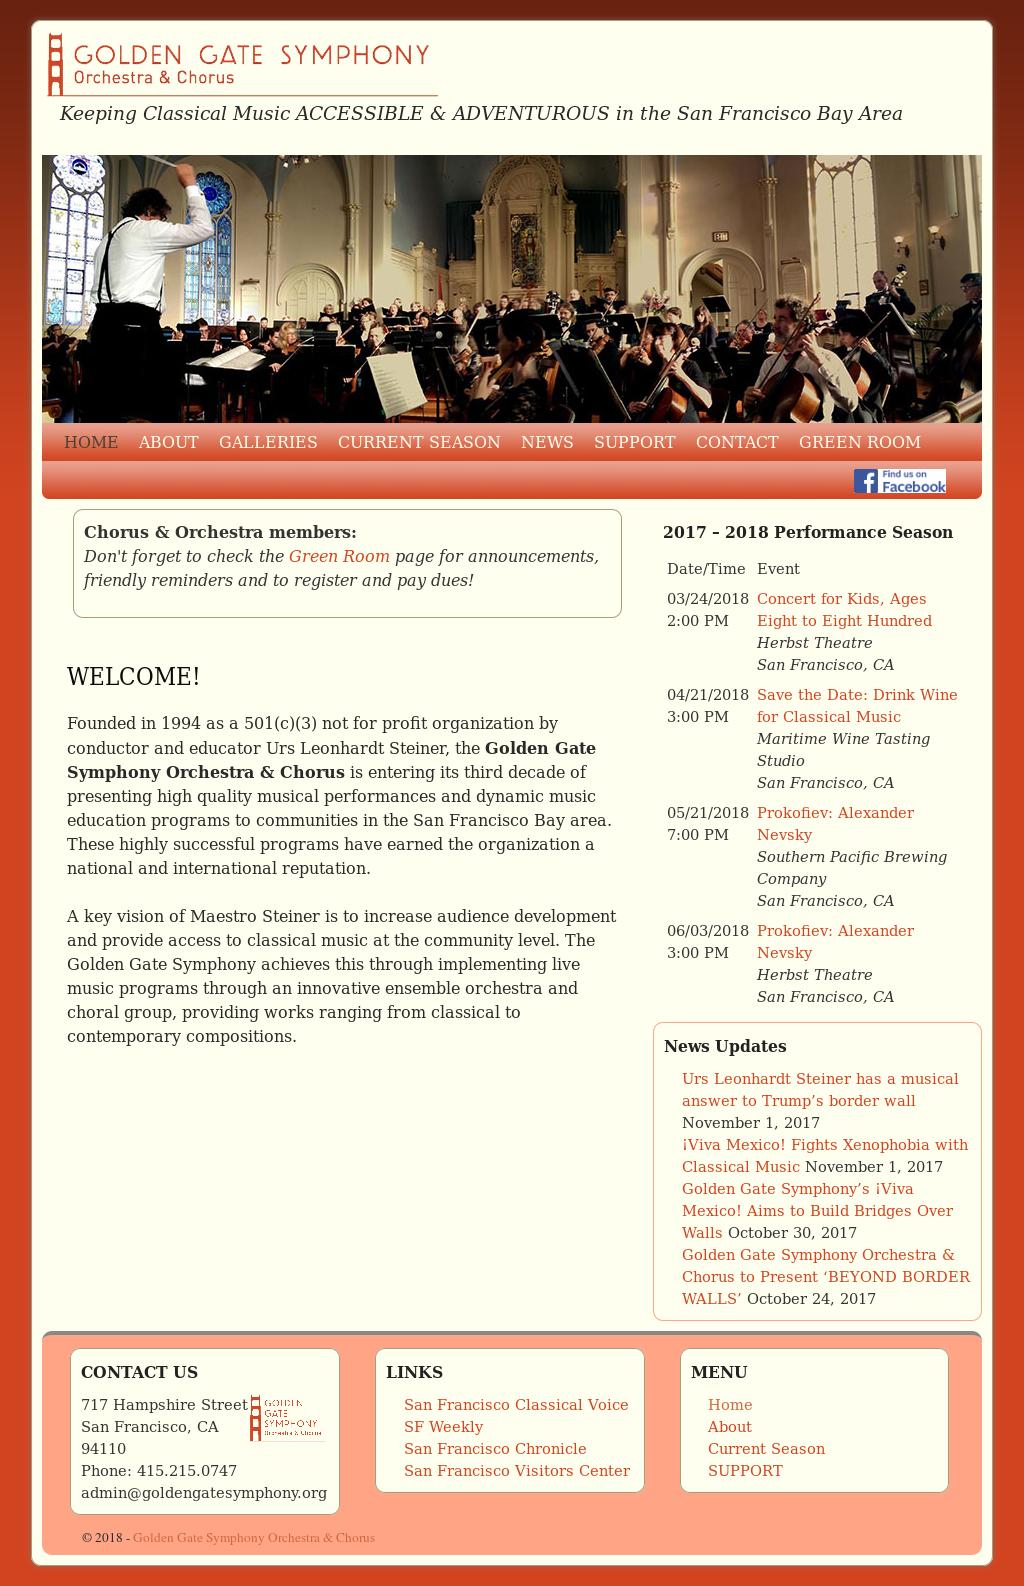 San Francisco Sinfonietta Orchestra & Chorus Competitors, Revenue